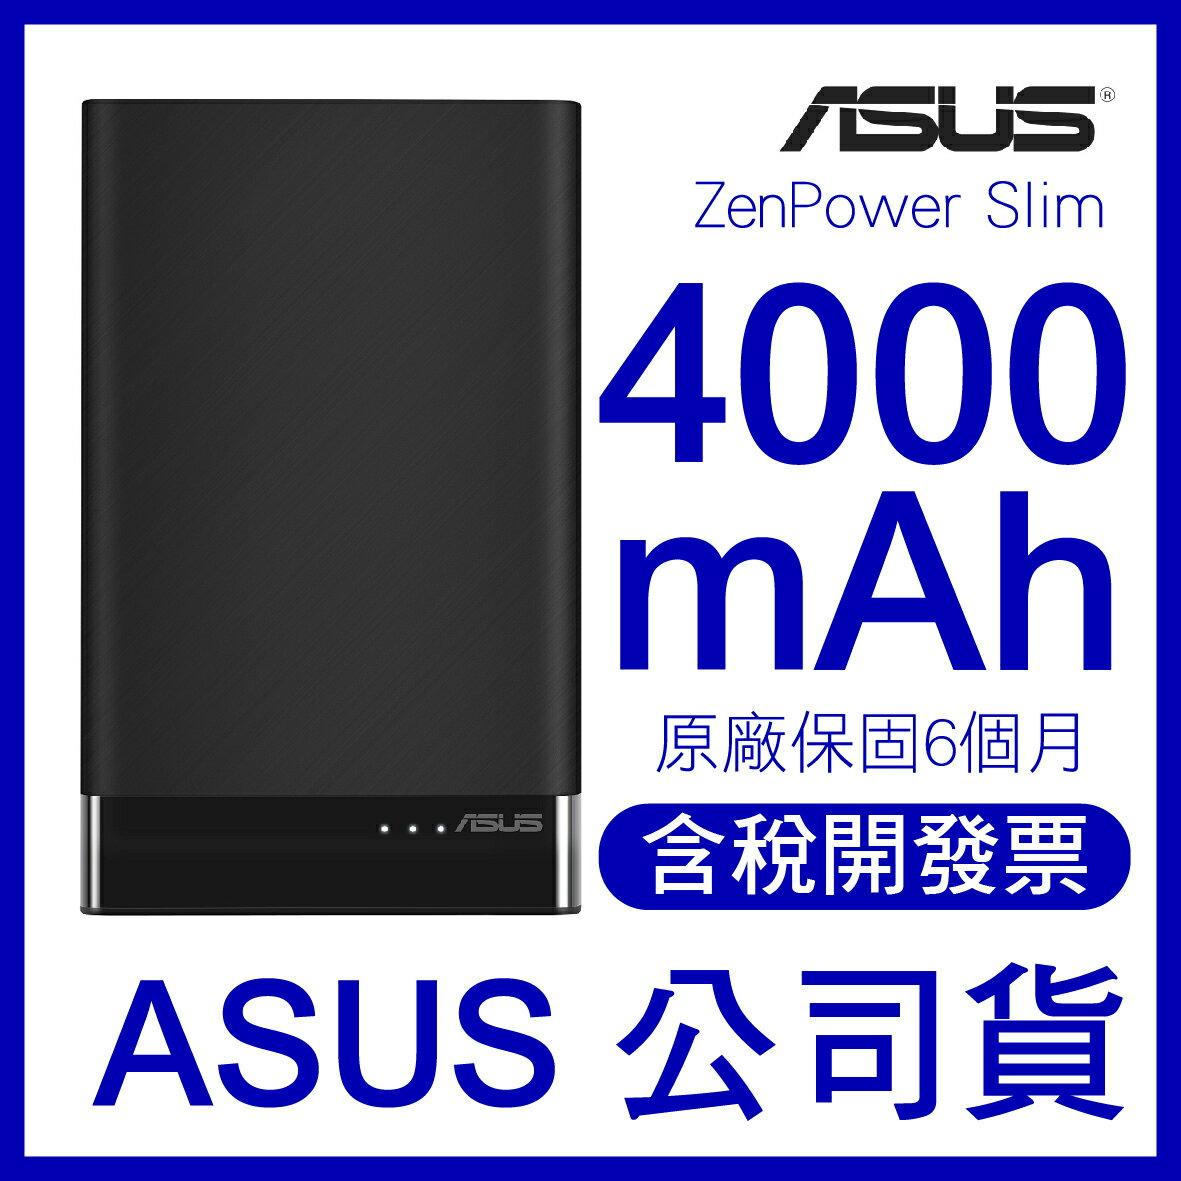 ASUS ZenPower Slim 4000 mAh 行動電源 晶礦黑 原廠保固 公司貨 髮絲紋 華碩